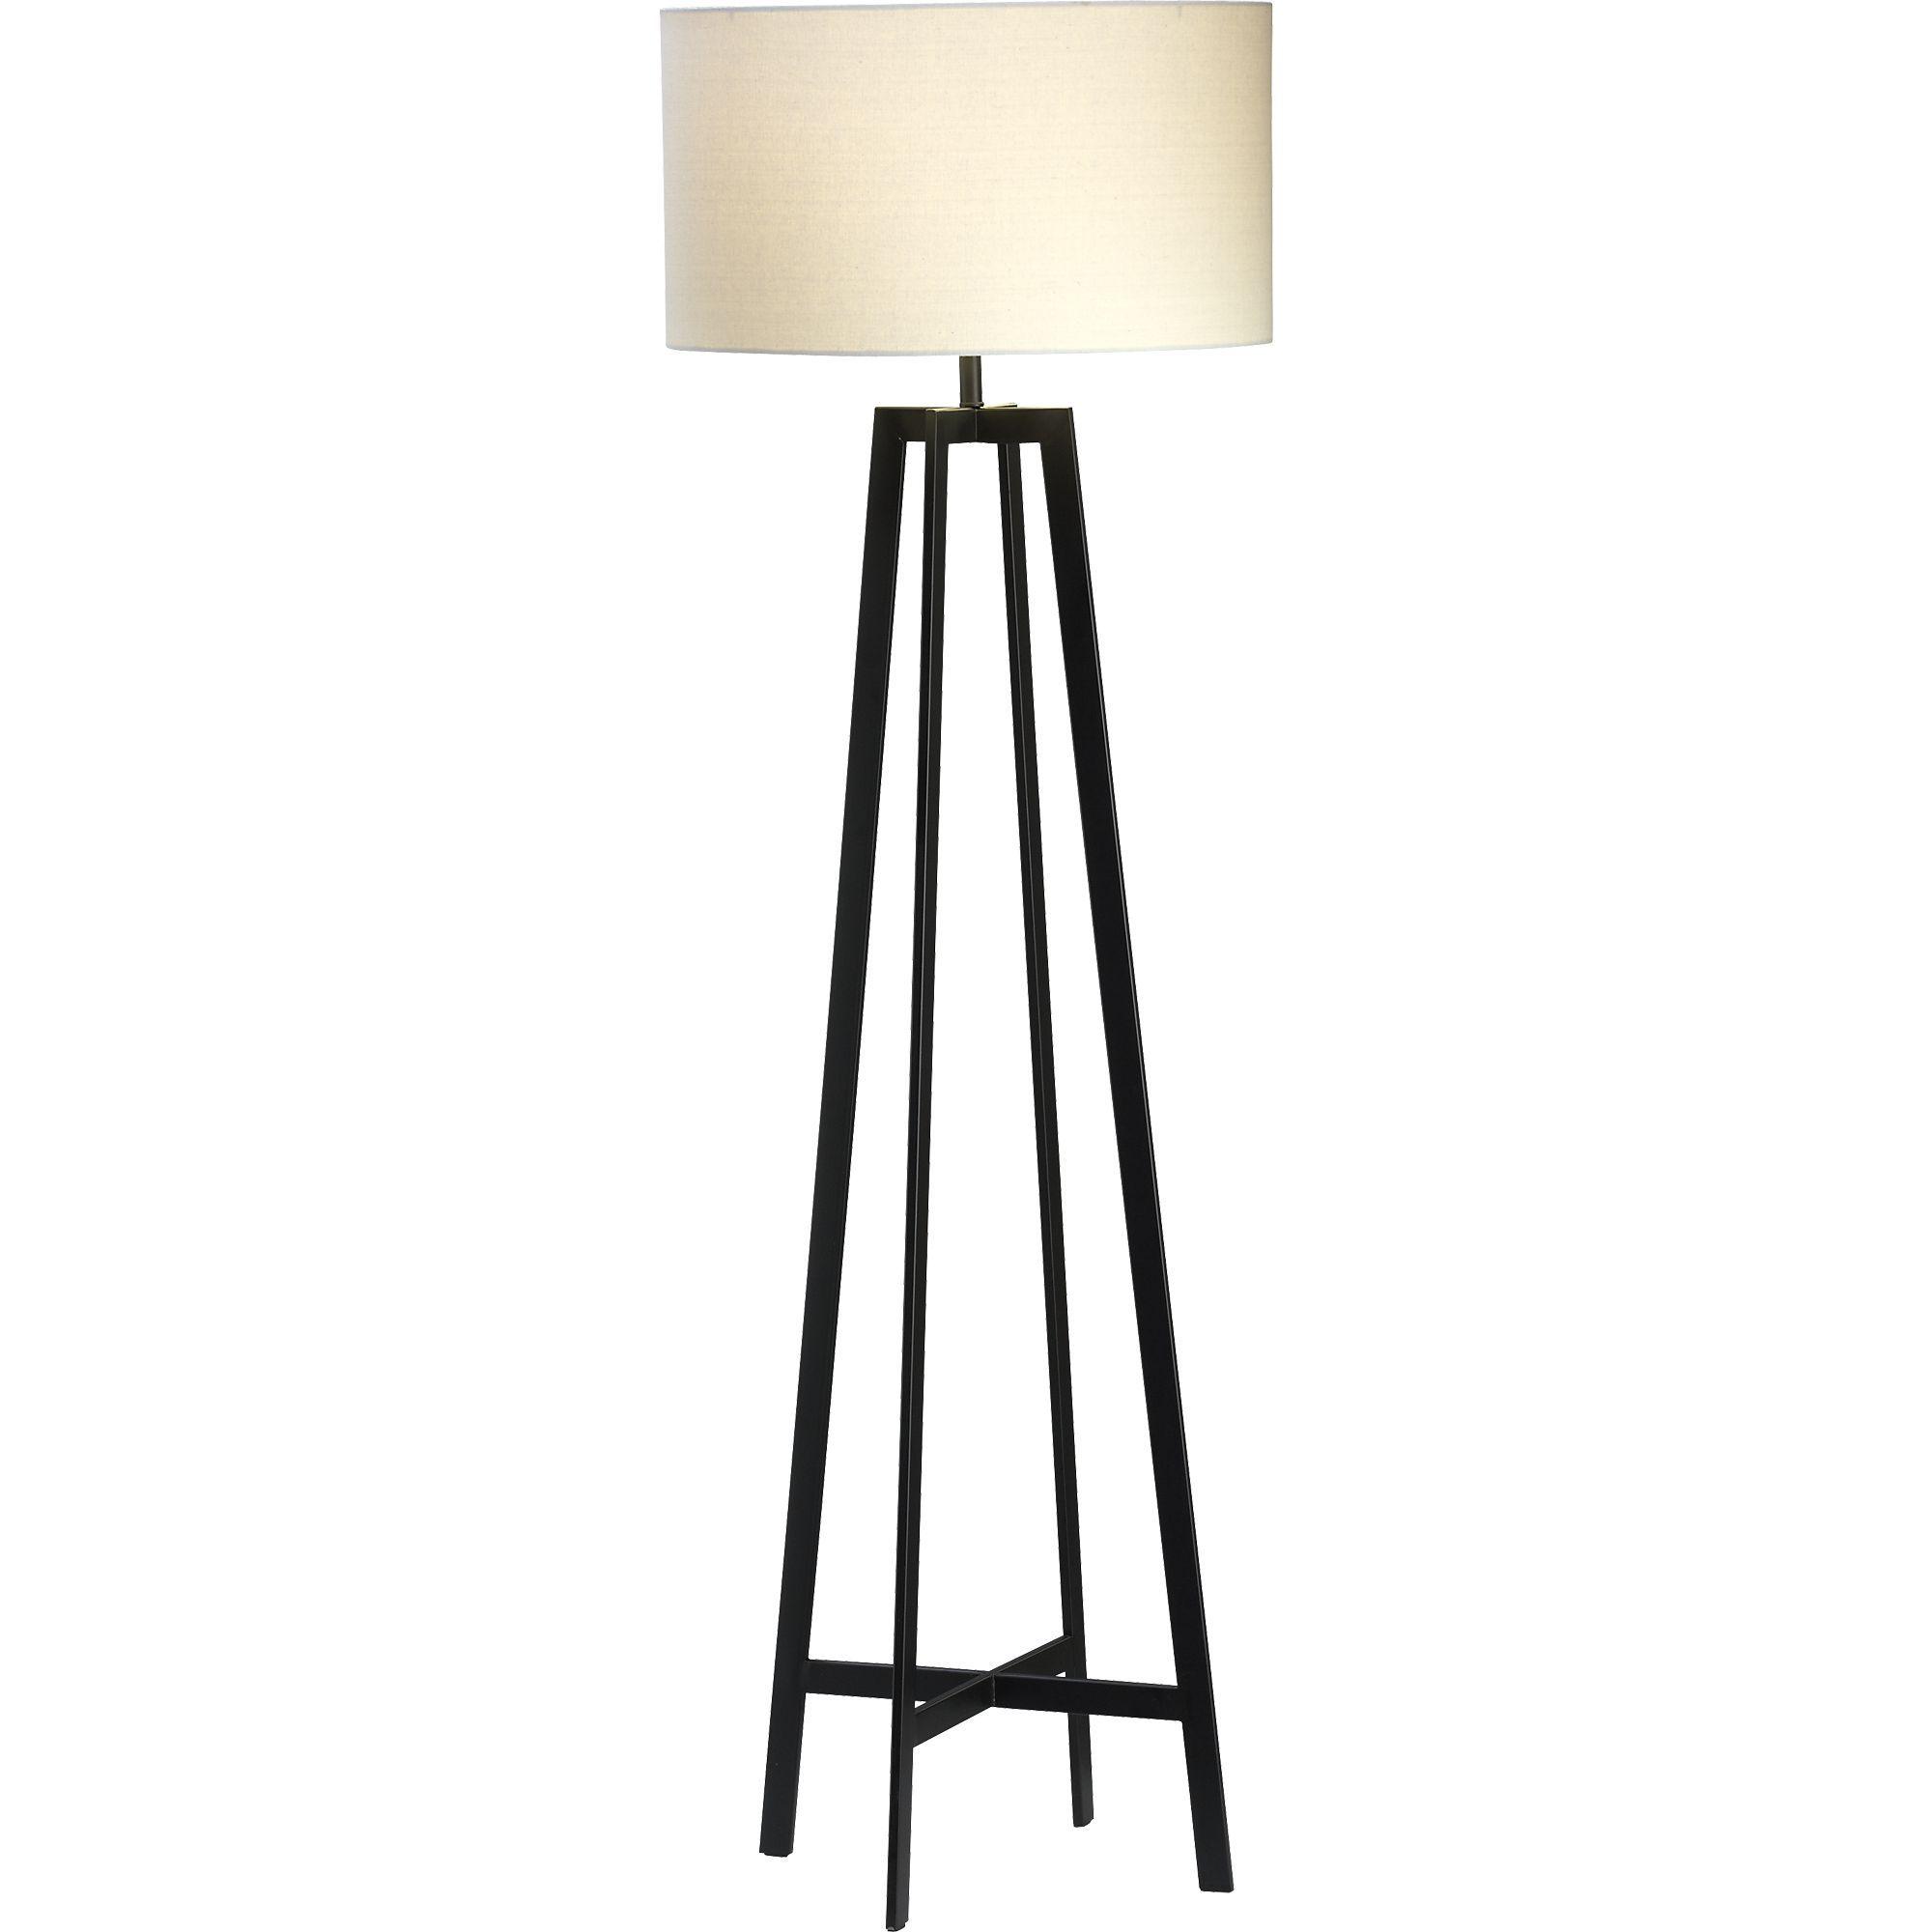 Castillo Black Floor Lamp Reviews Crate And Barrel In 2020